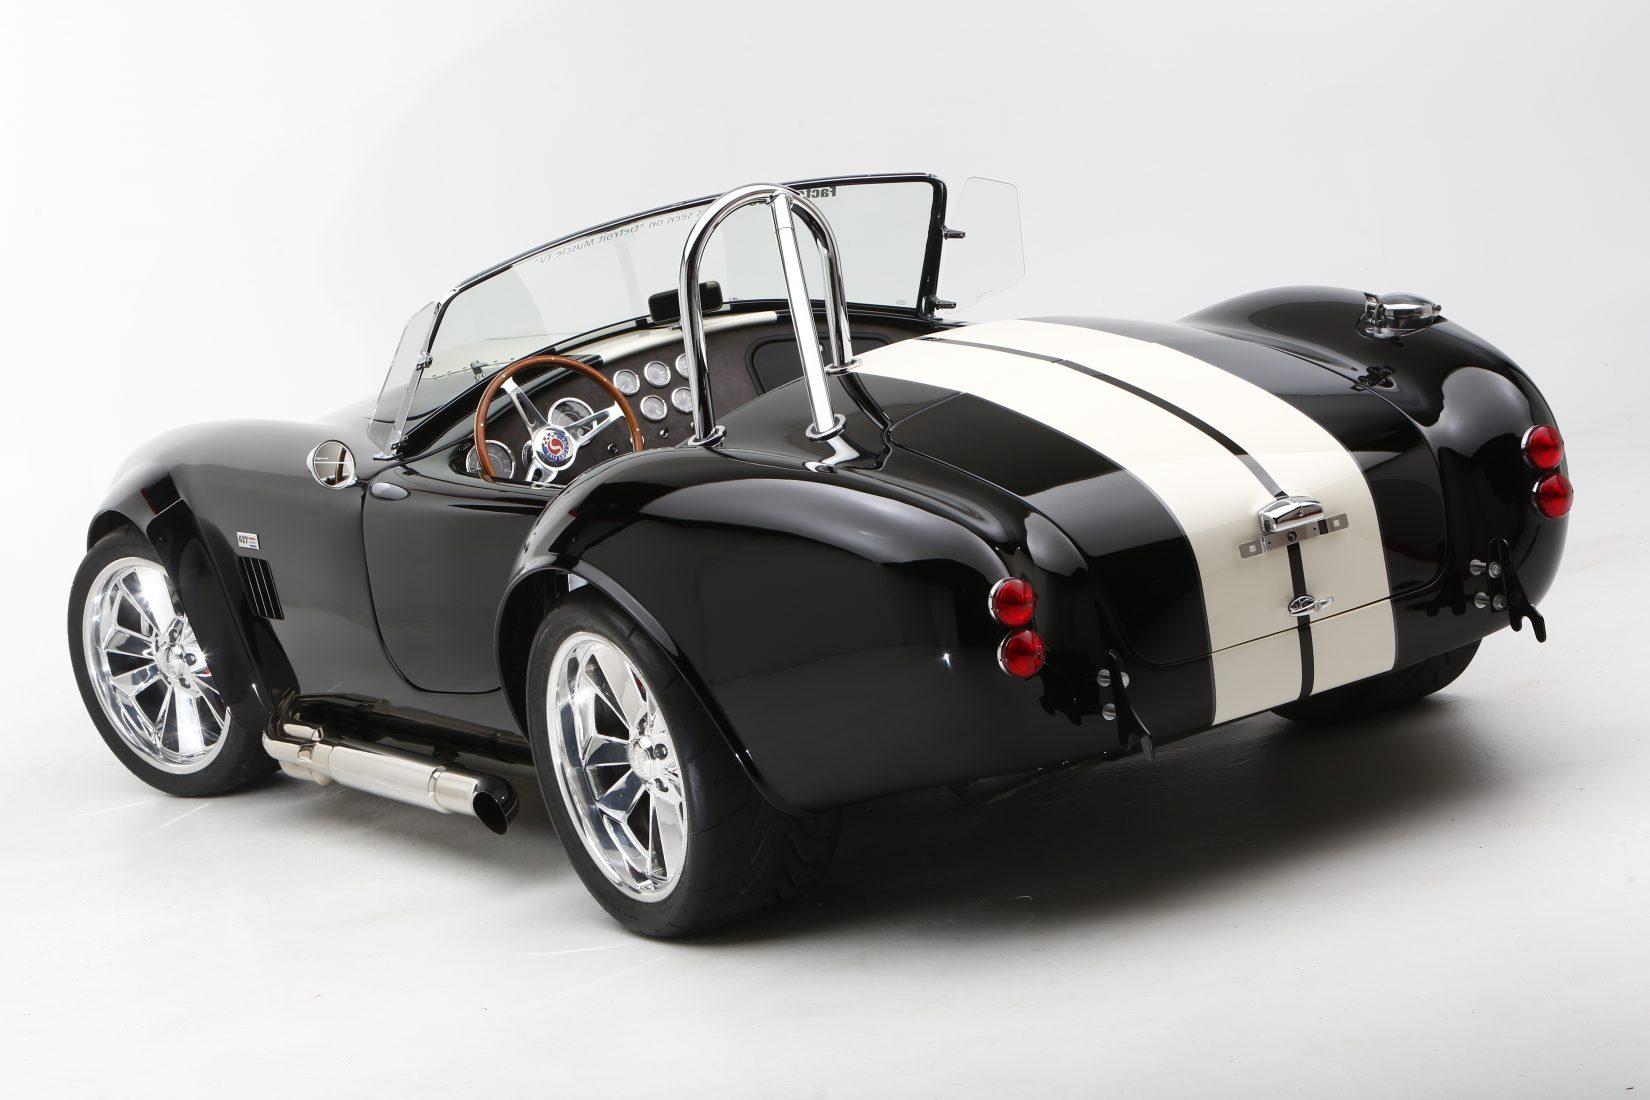 kit cars Factory Five MK4Roadster